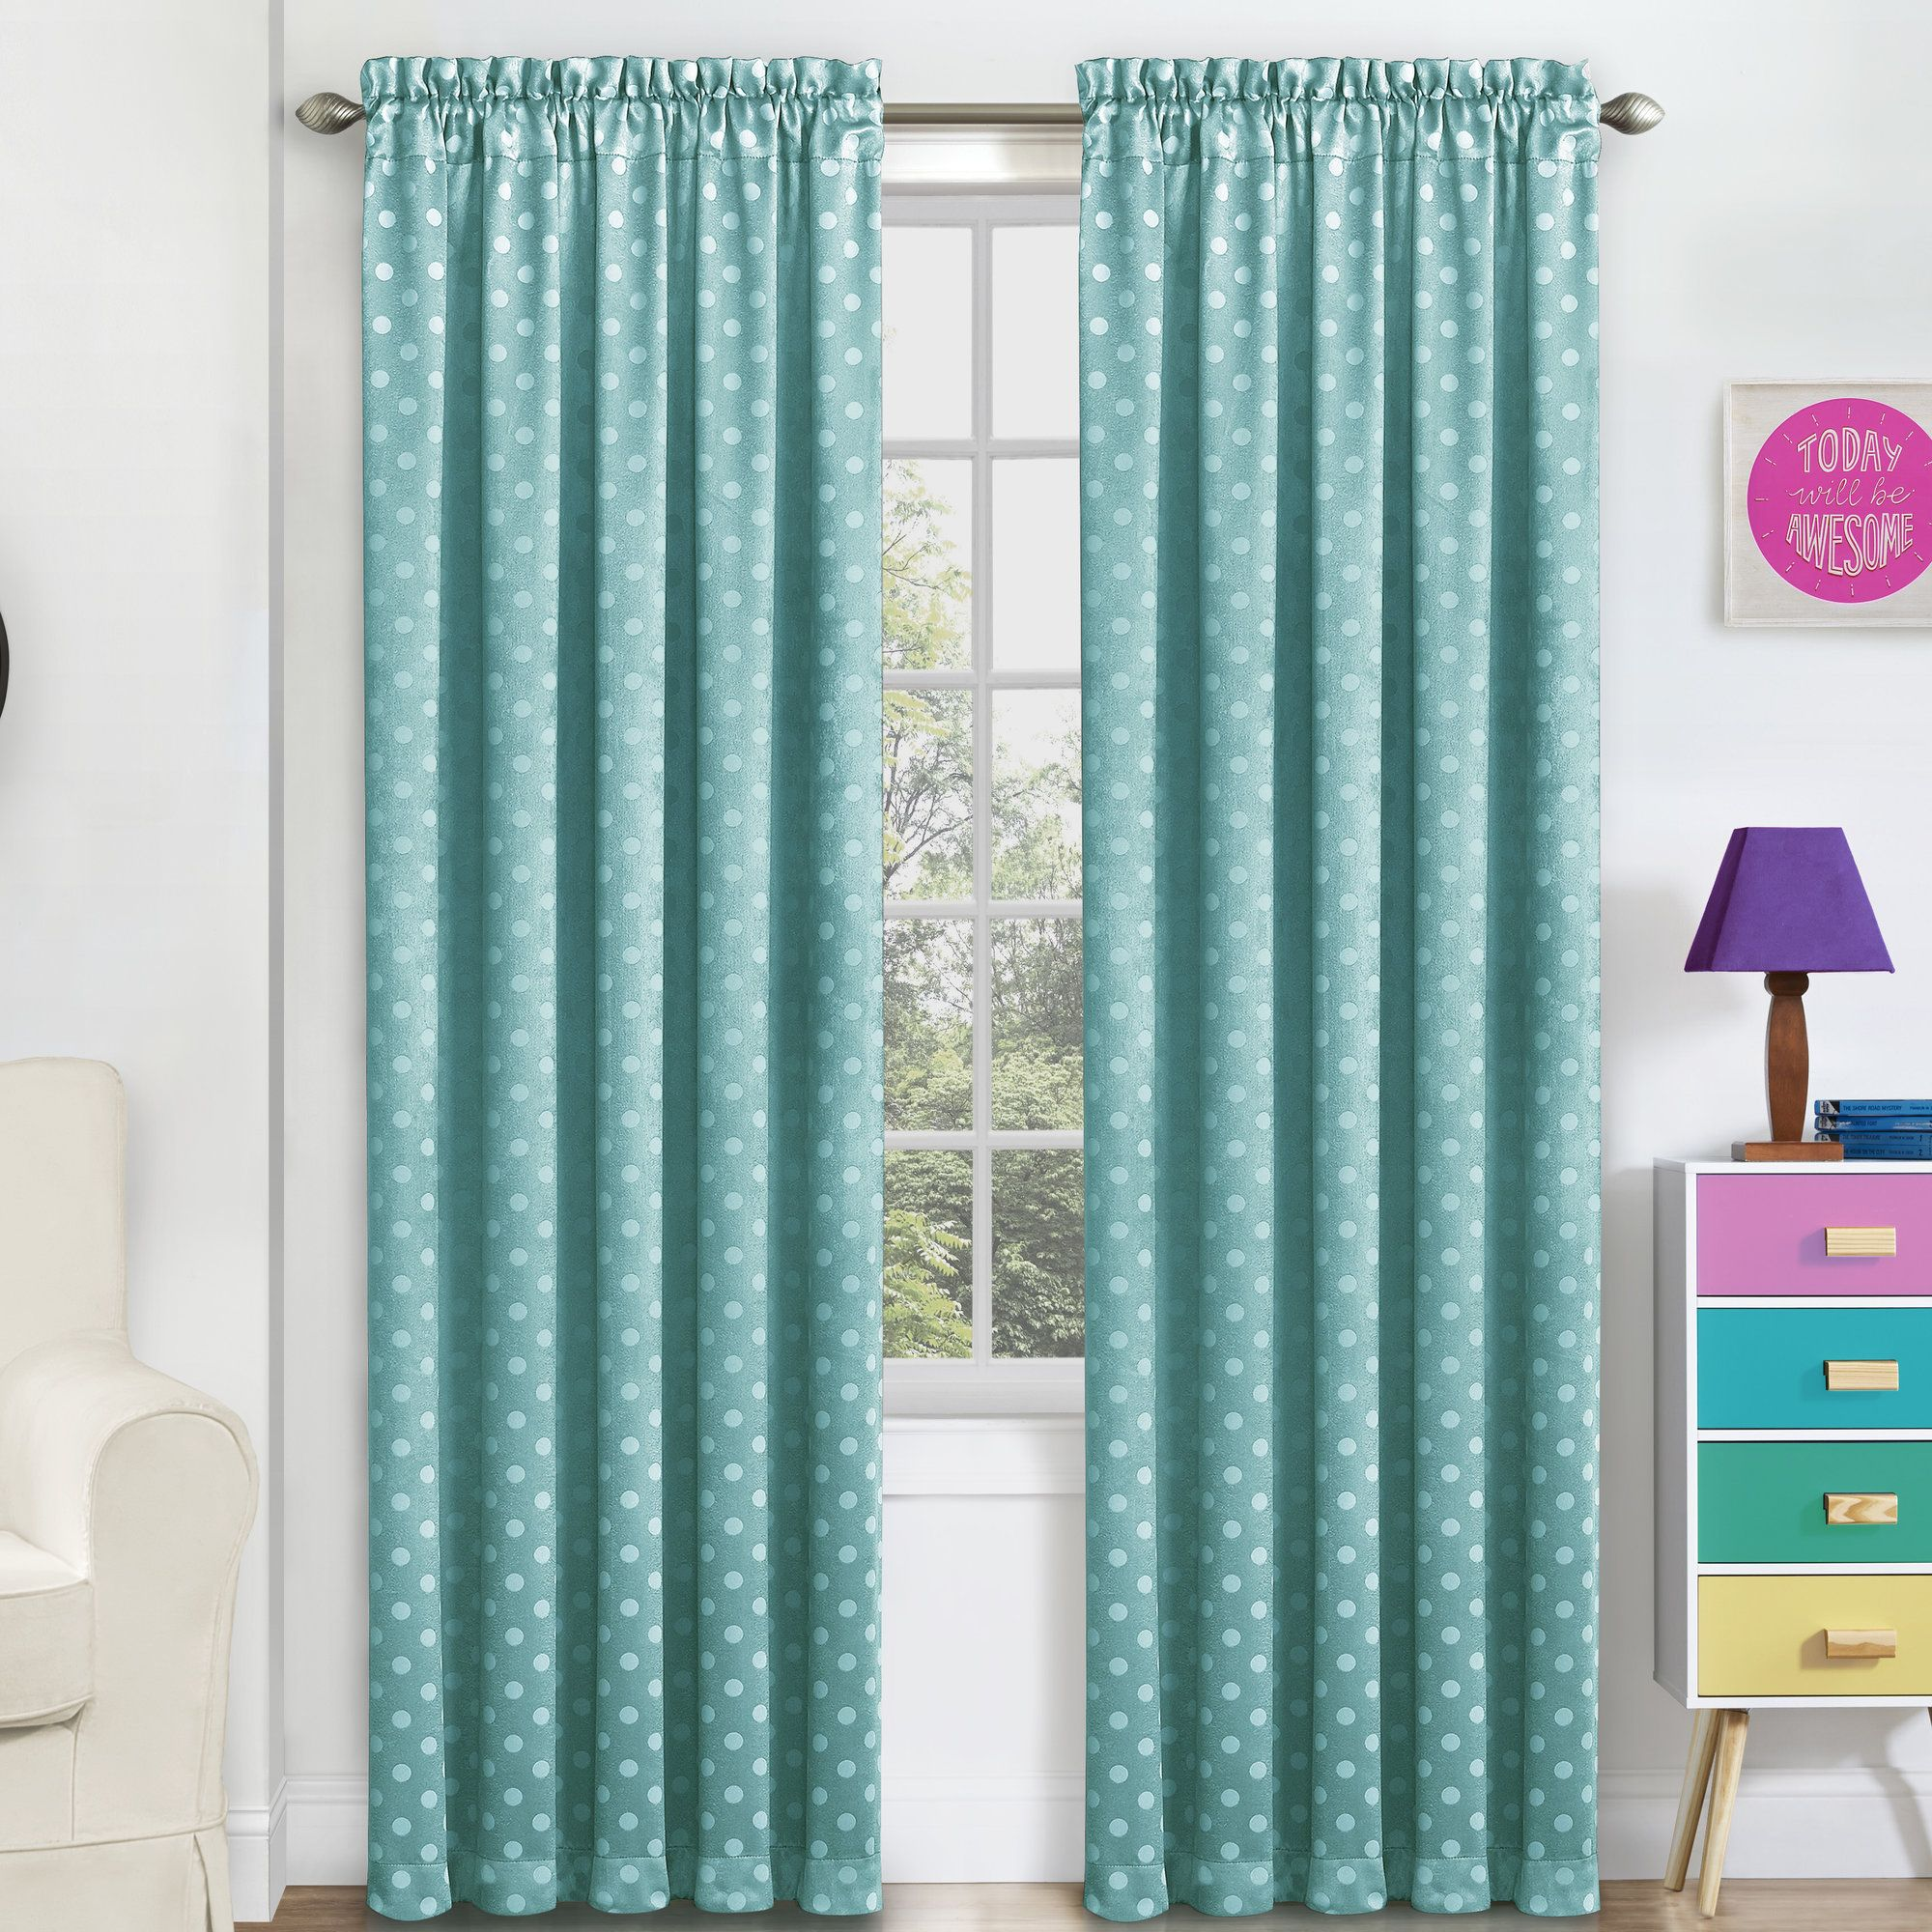 Trevon Polka Dots Blackout Thermal Rod Pocket Single Curtain Panel